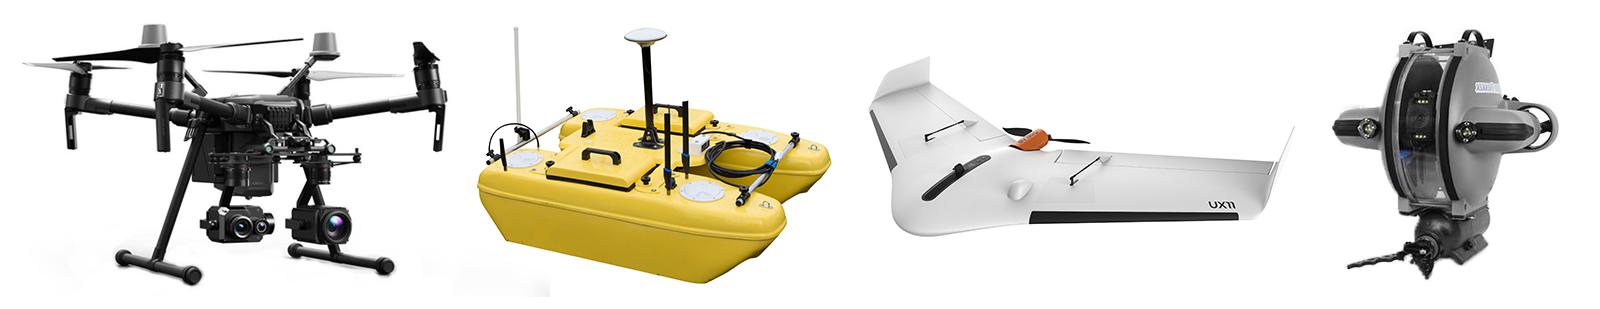 salon escadrone drone professionnel dji matrice 210 rtk, delair ux11, Deep-trekker DTG3, bathydrone